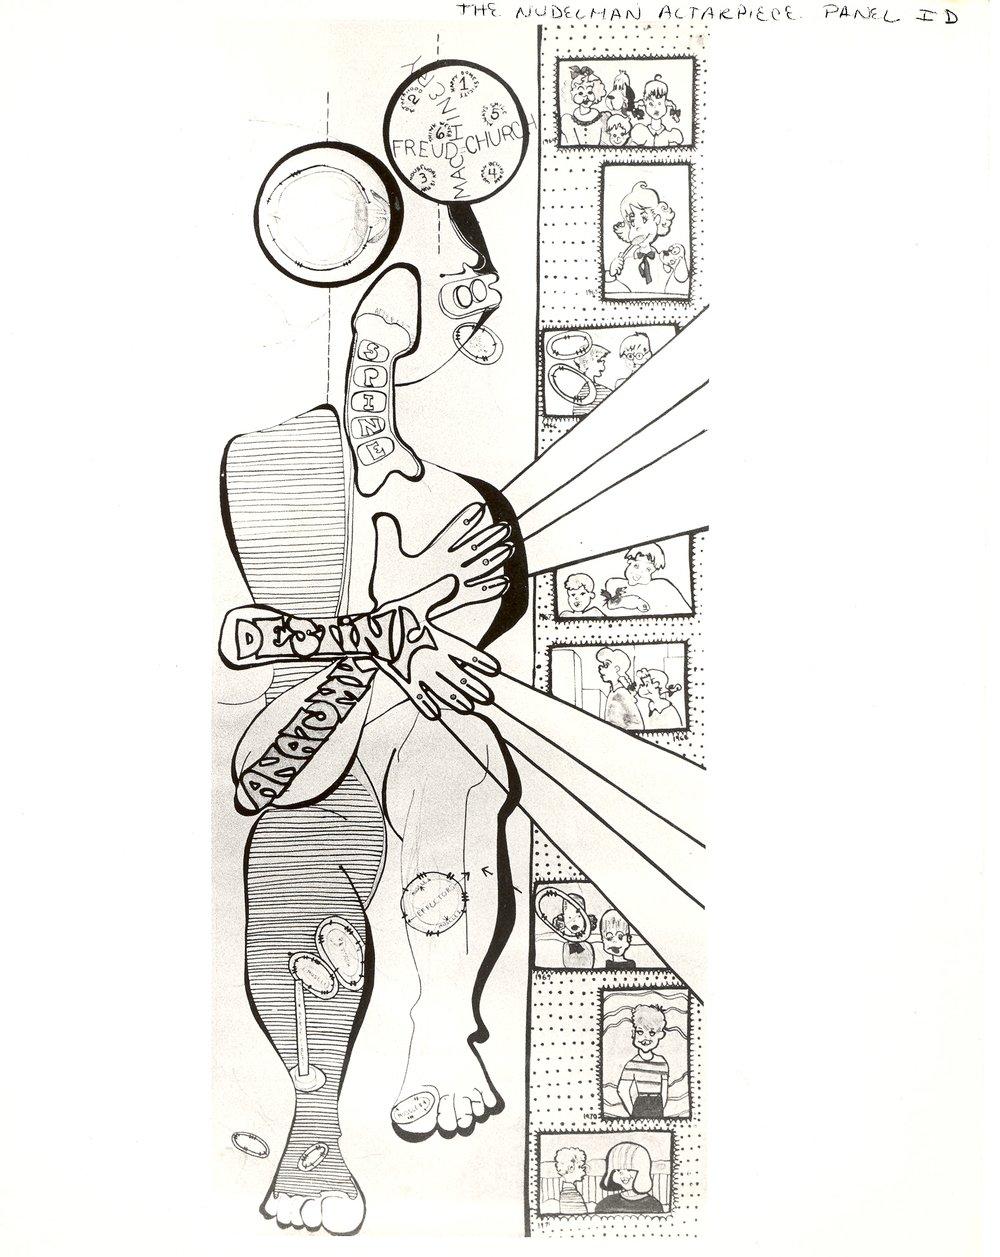 Nudelman Alterpiece - Box I - Panel D.jpg